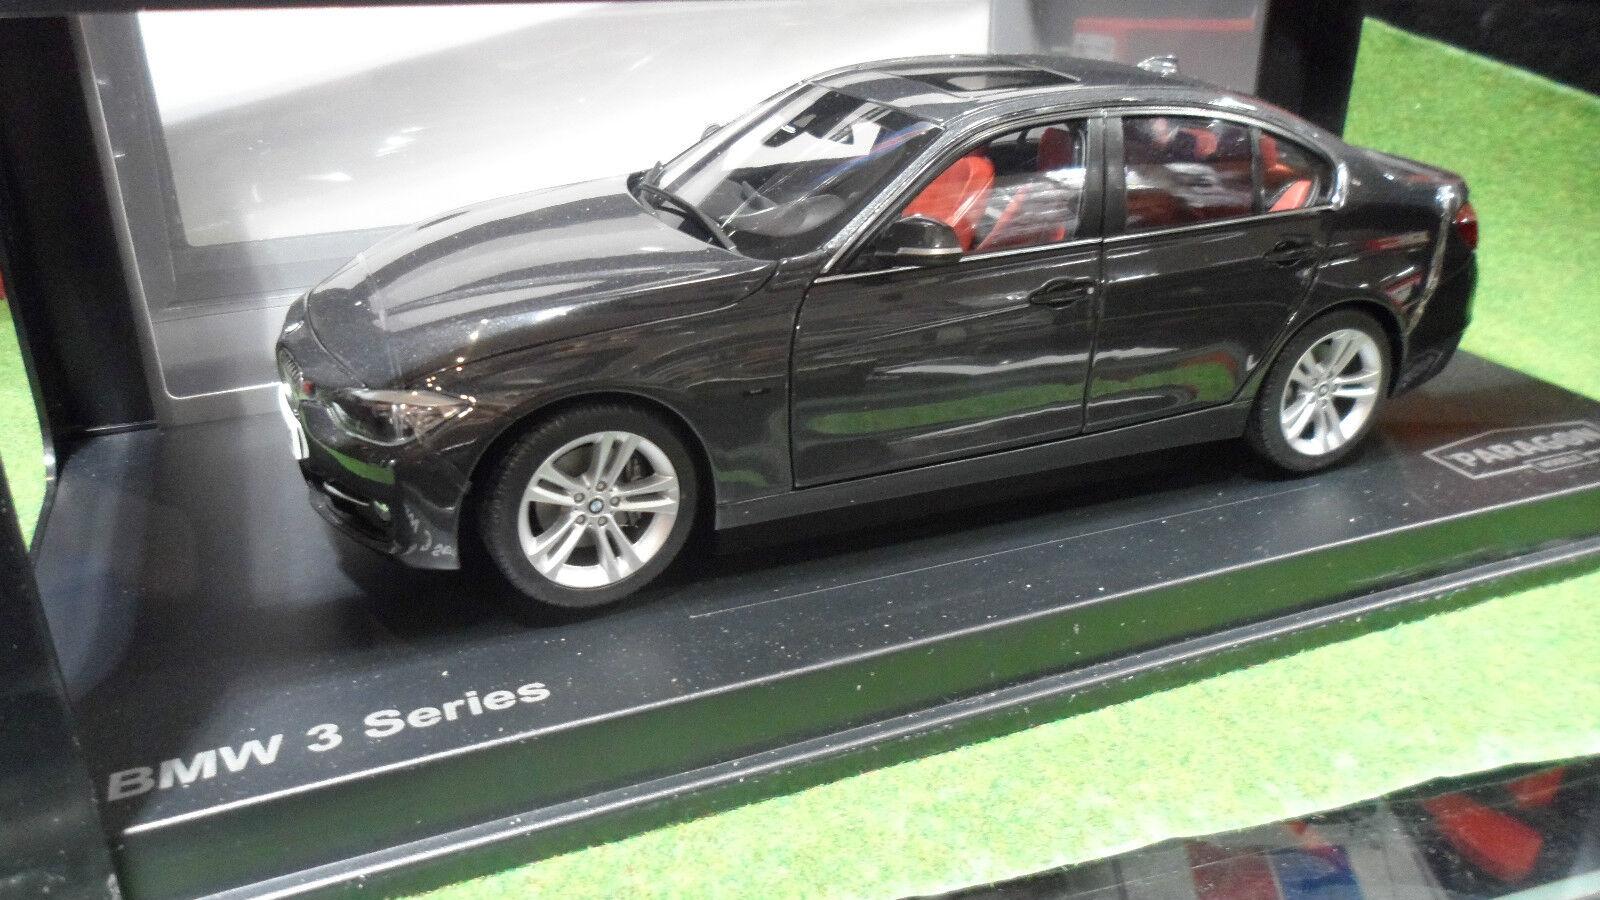 online al mejor precio BMW 3 SERIES gris berline 1 18 PARAGON PARAGON PARAGON PA - 97025 voiture miniature d collection  increíbles descuentos